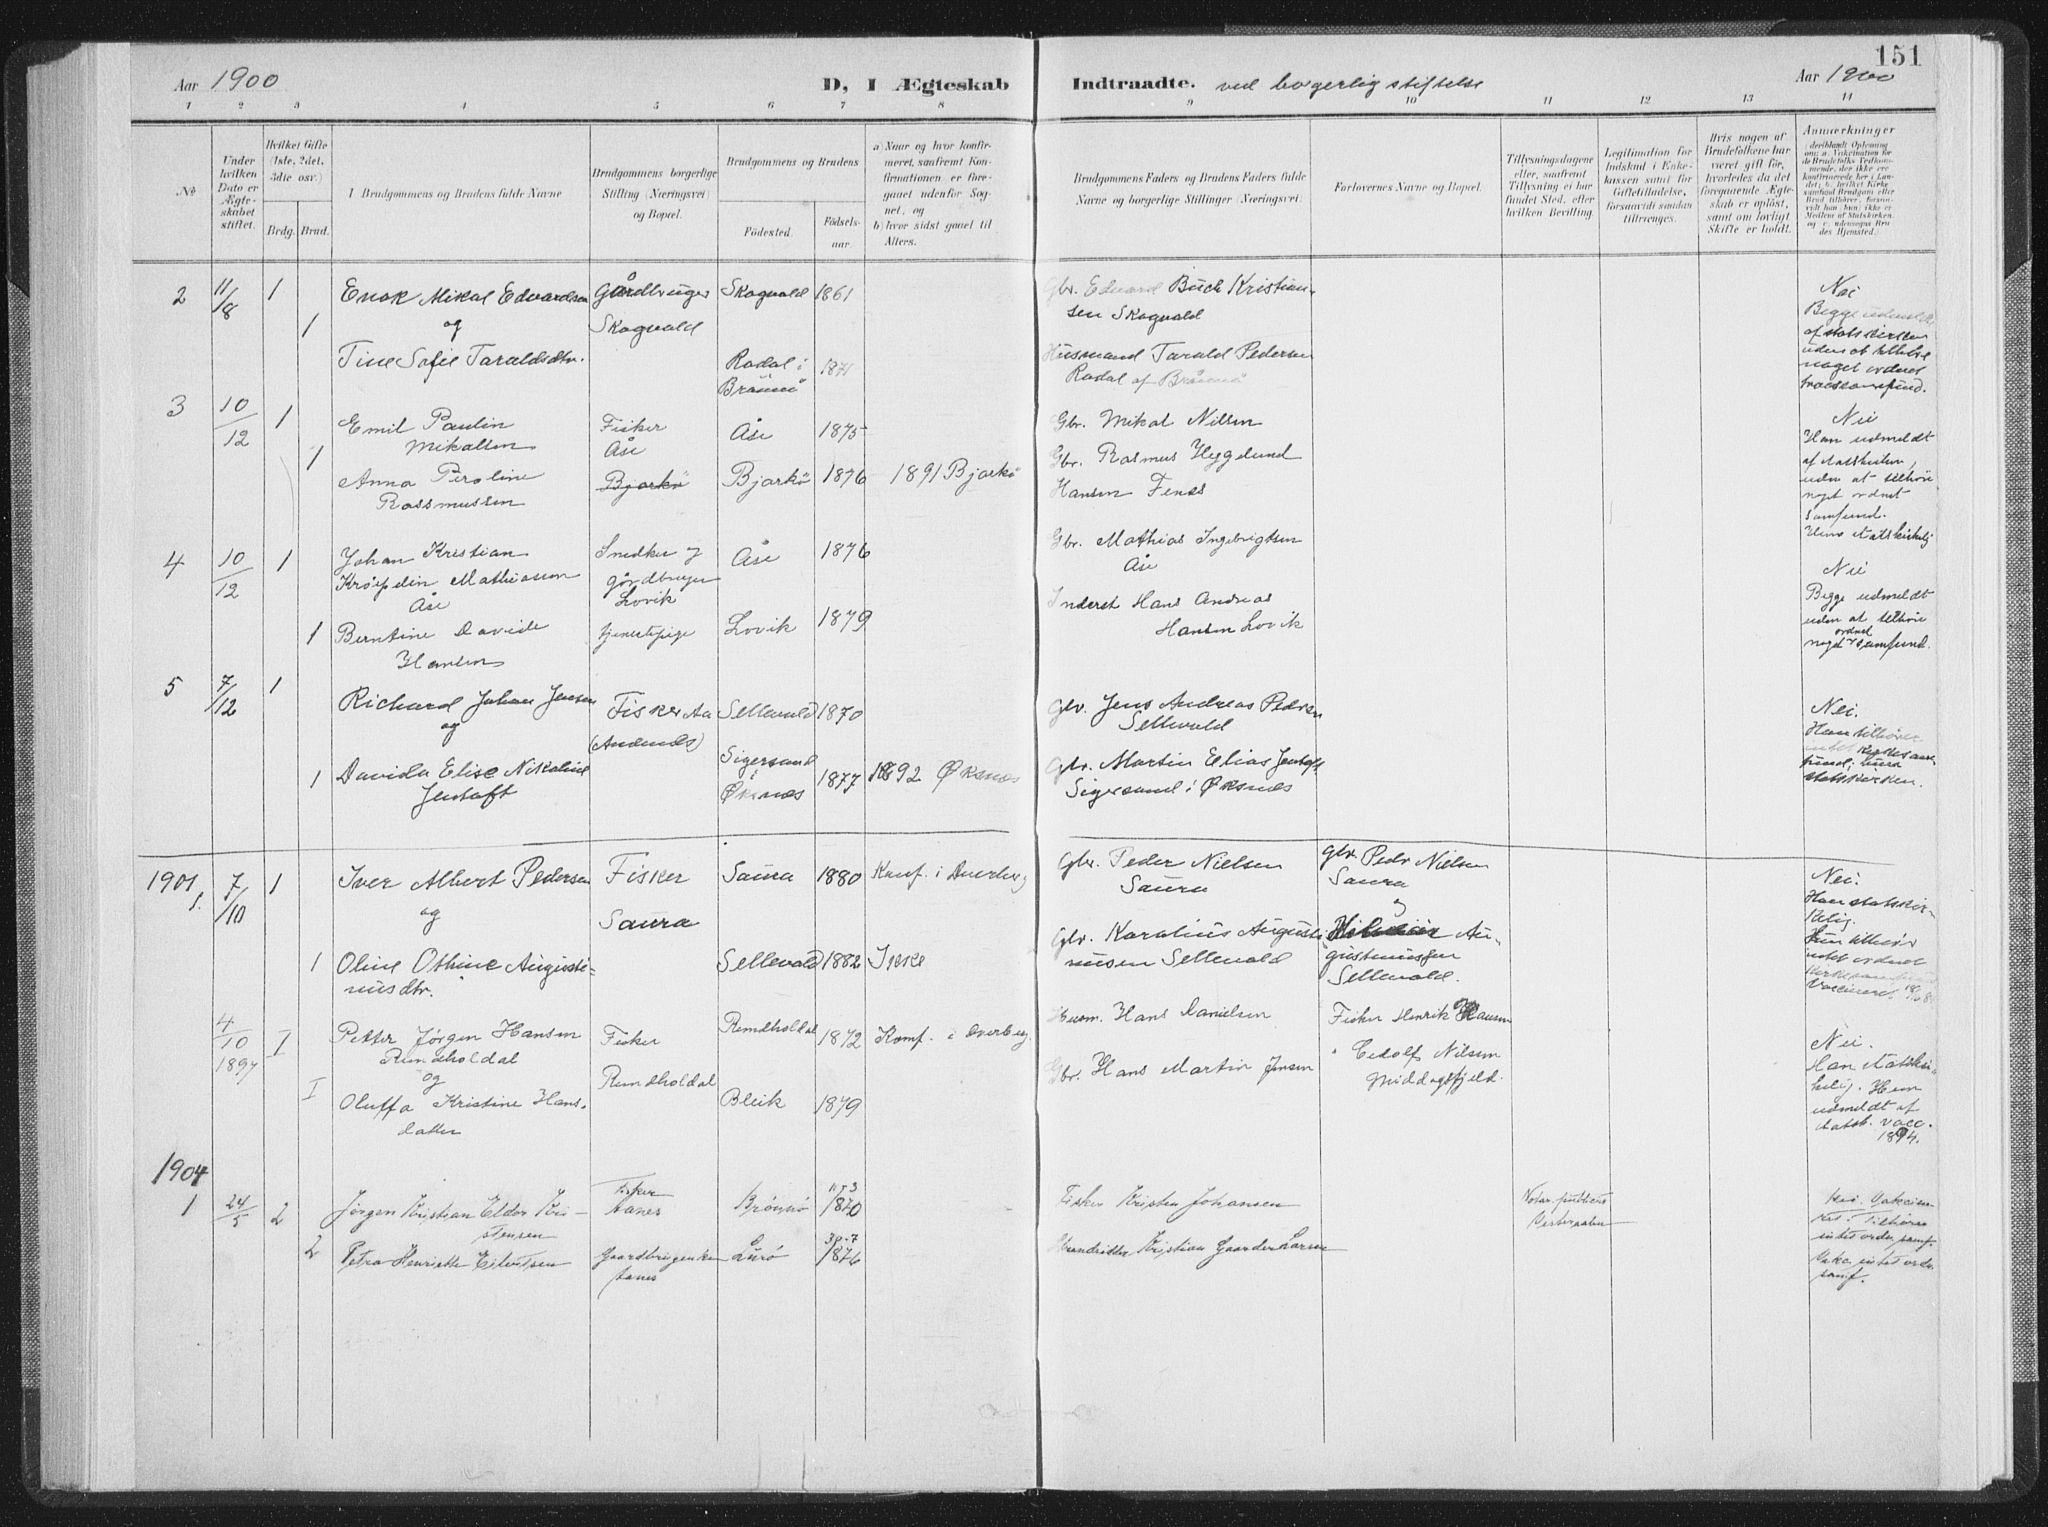 SAT, Ministerialprotokoller, klokkerbøker og fødselsregistre - Nordland, 897/L1400: Ministerialbok nr. 897A07, 1897-1908, s. 151